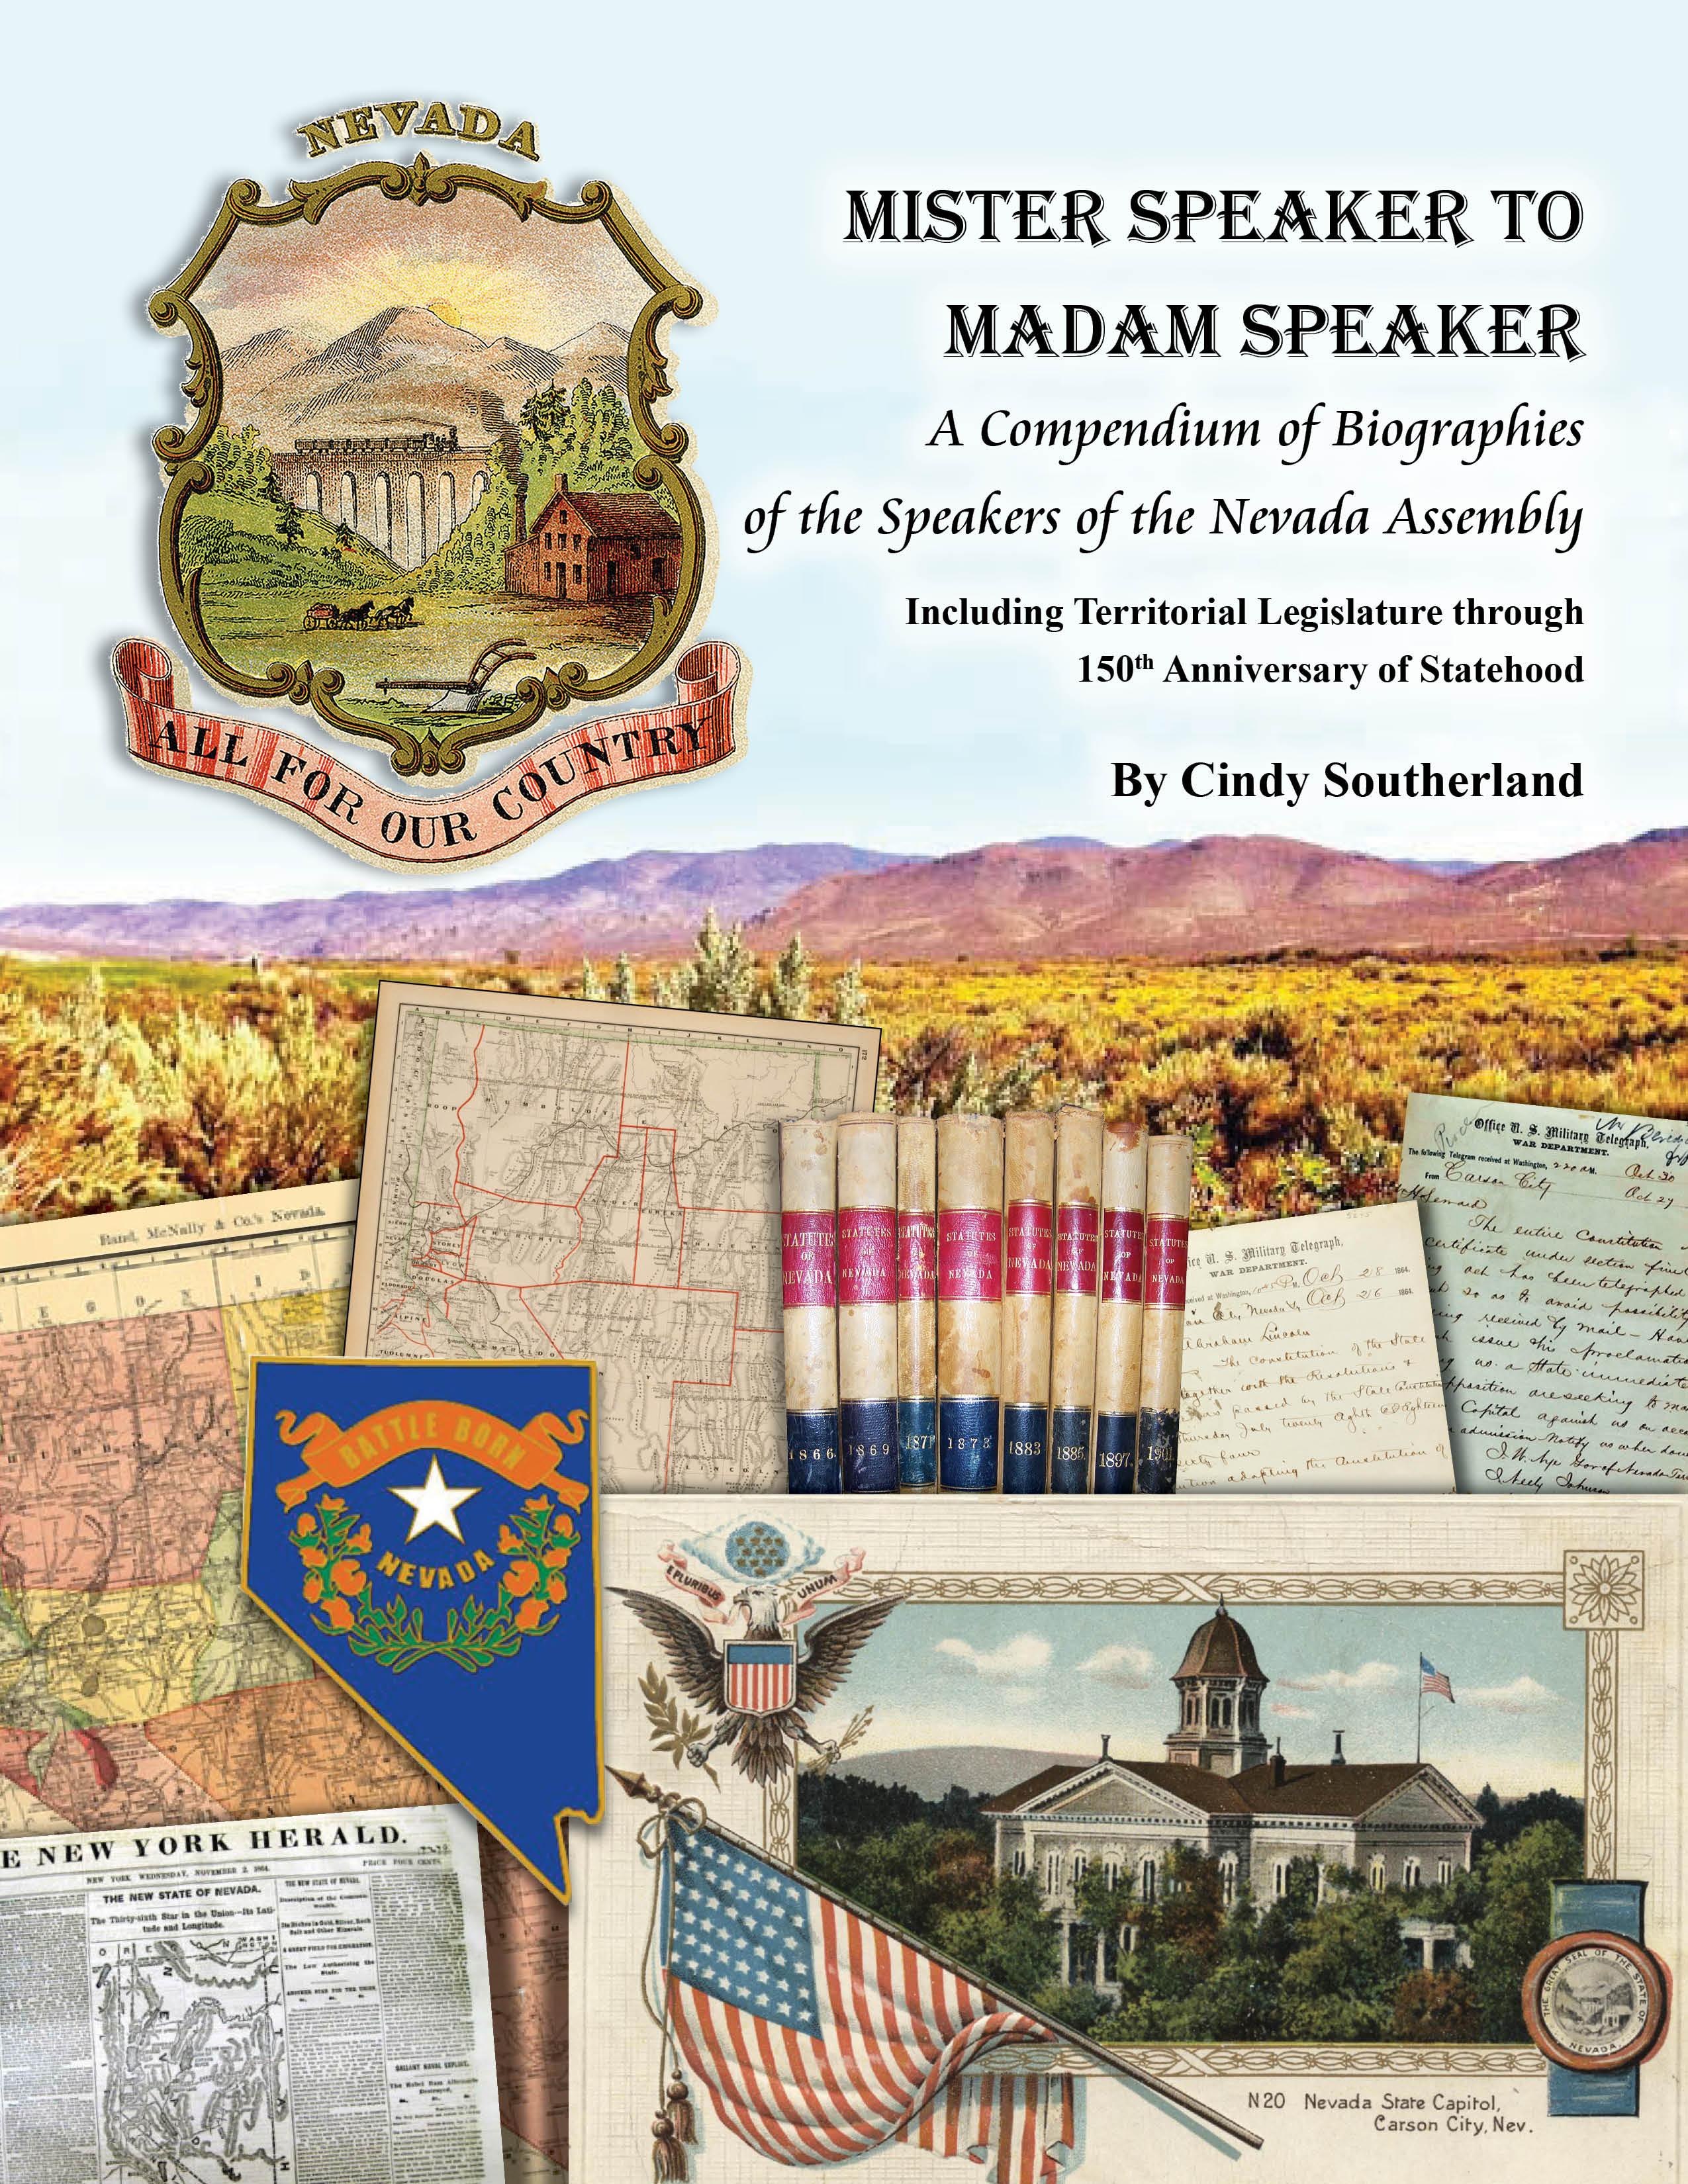 Mister Speaker To Madam Speaker Biographies Of The Nevada Assembly Speakers